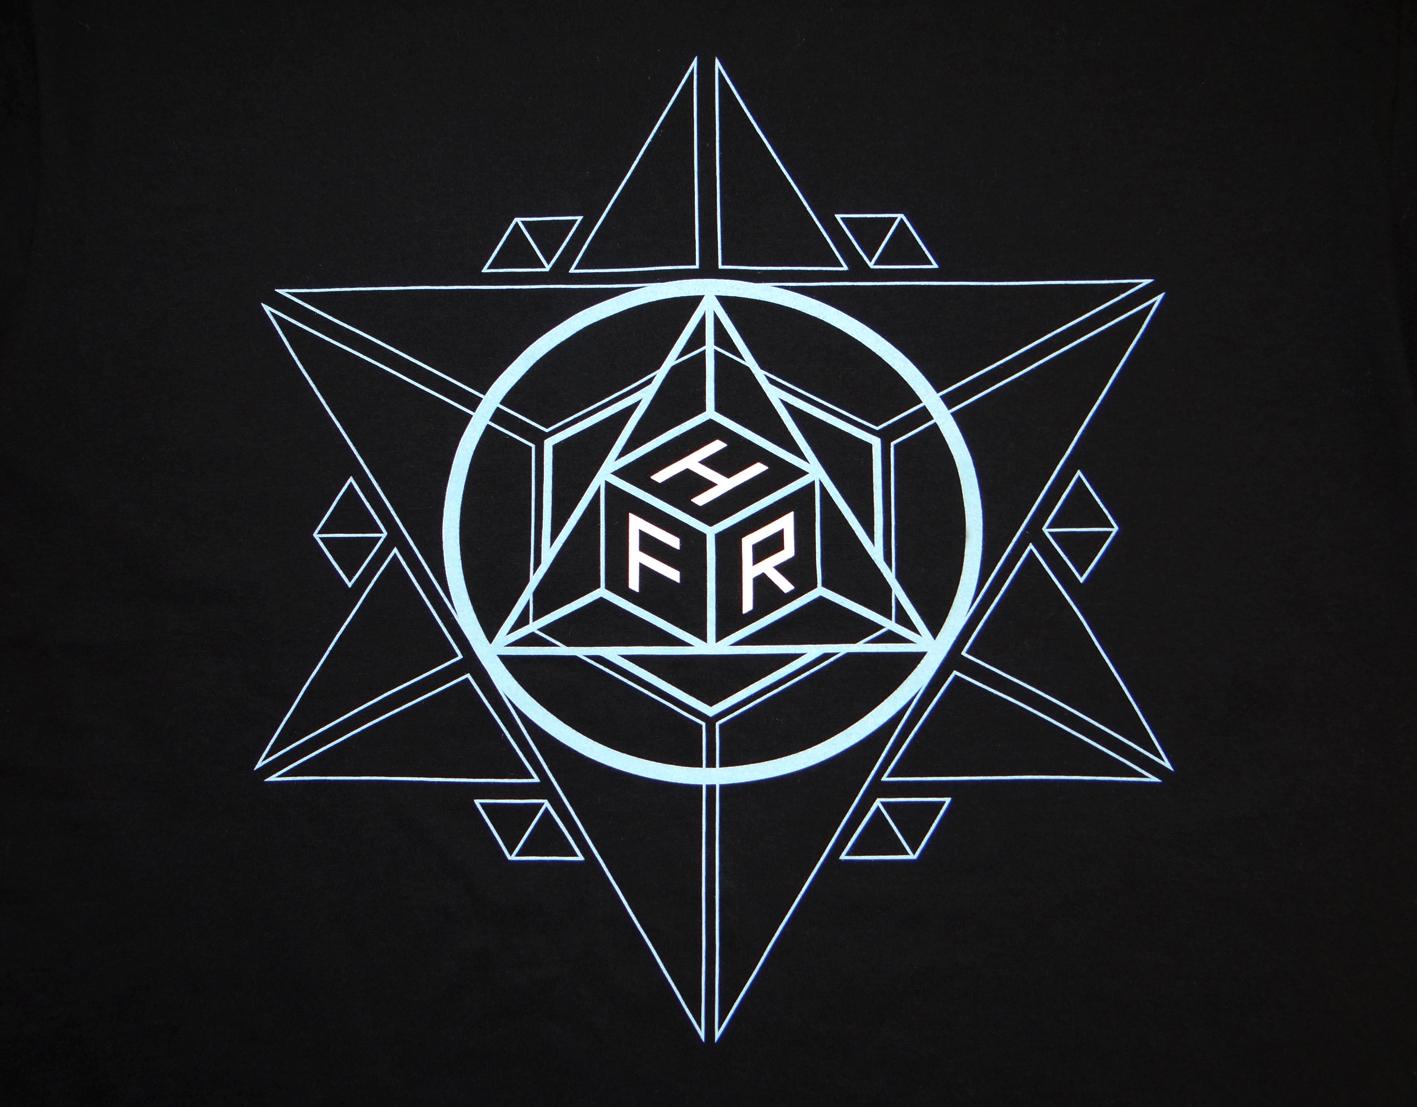 HF STAR 4